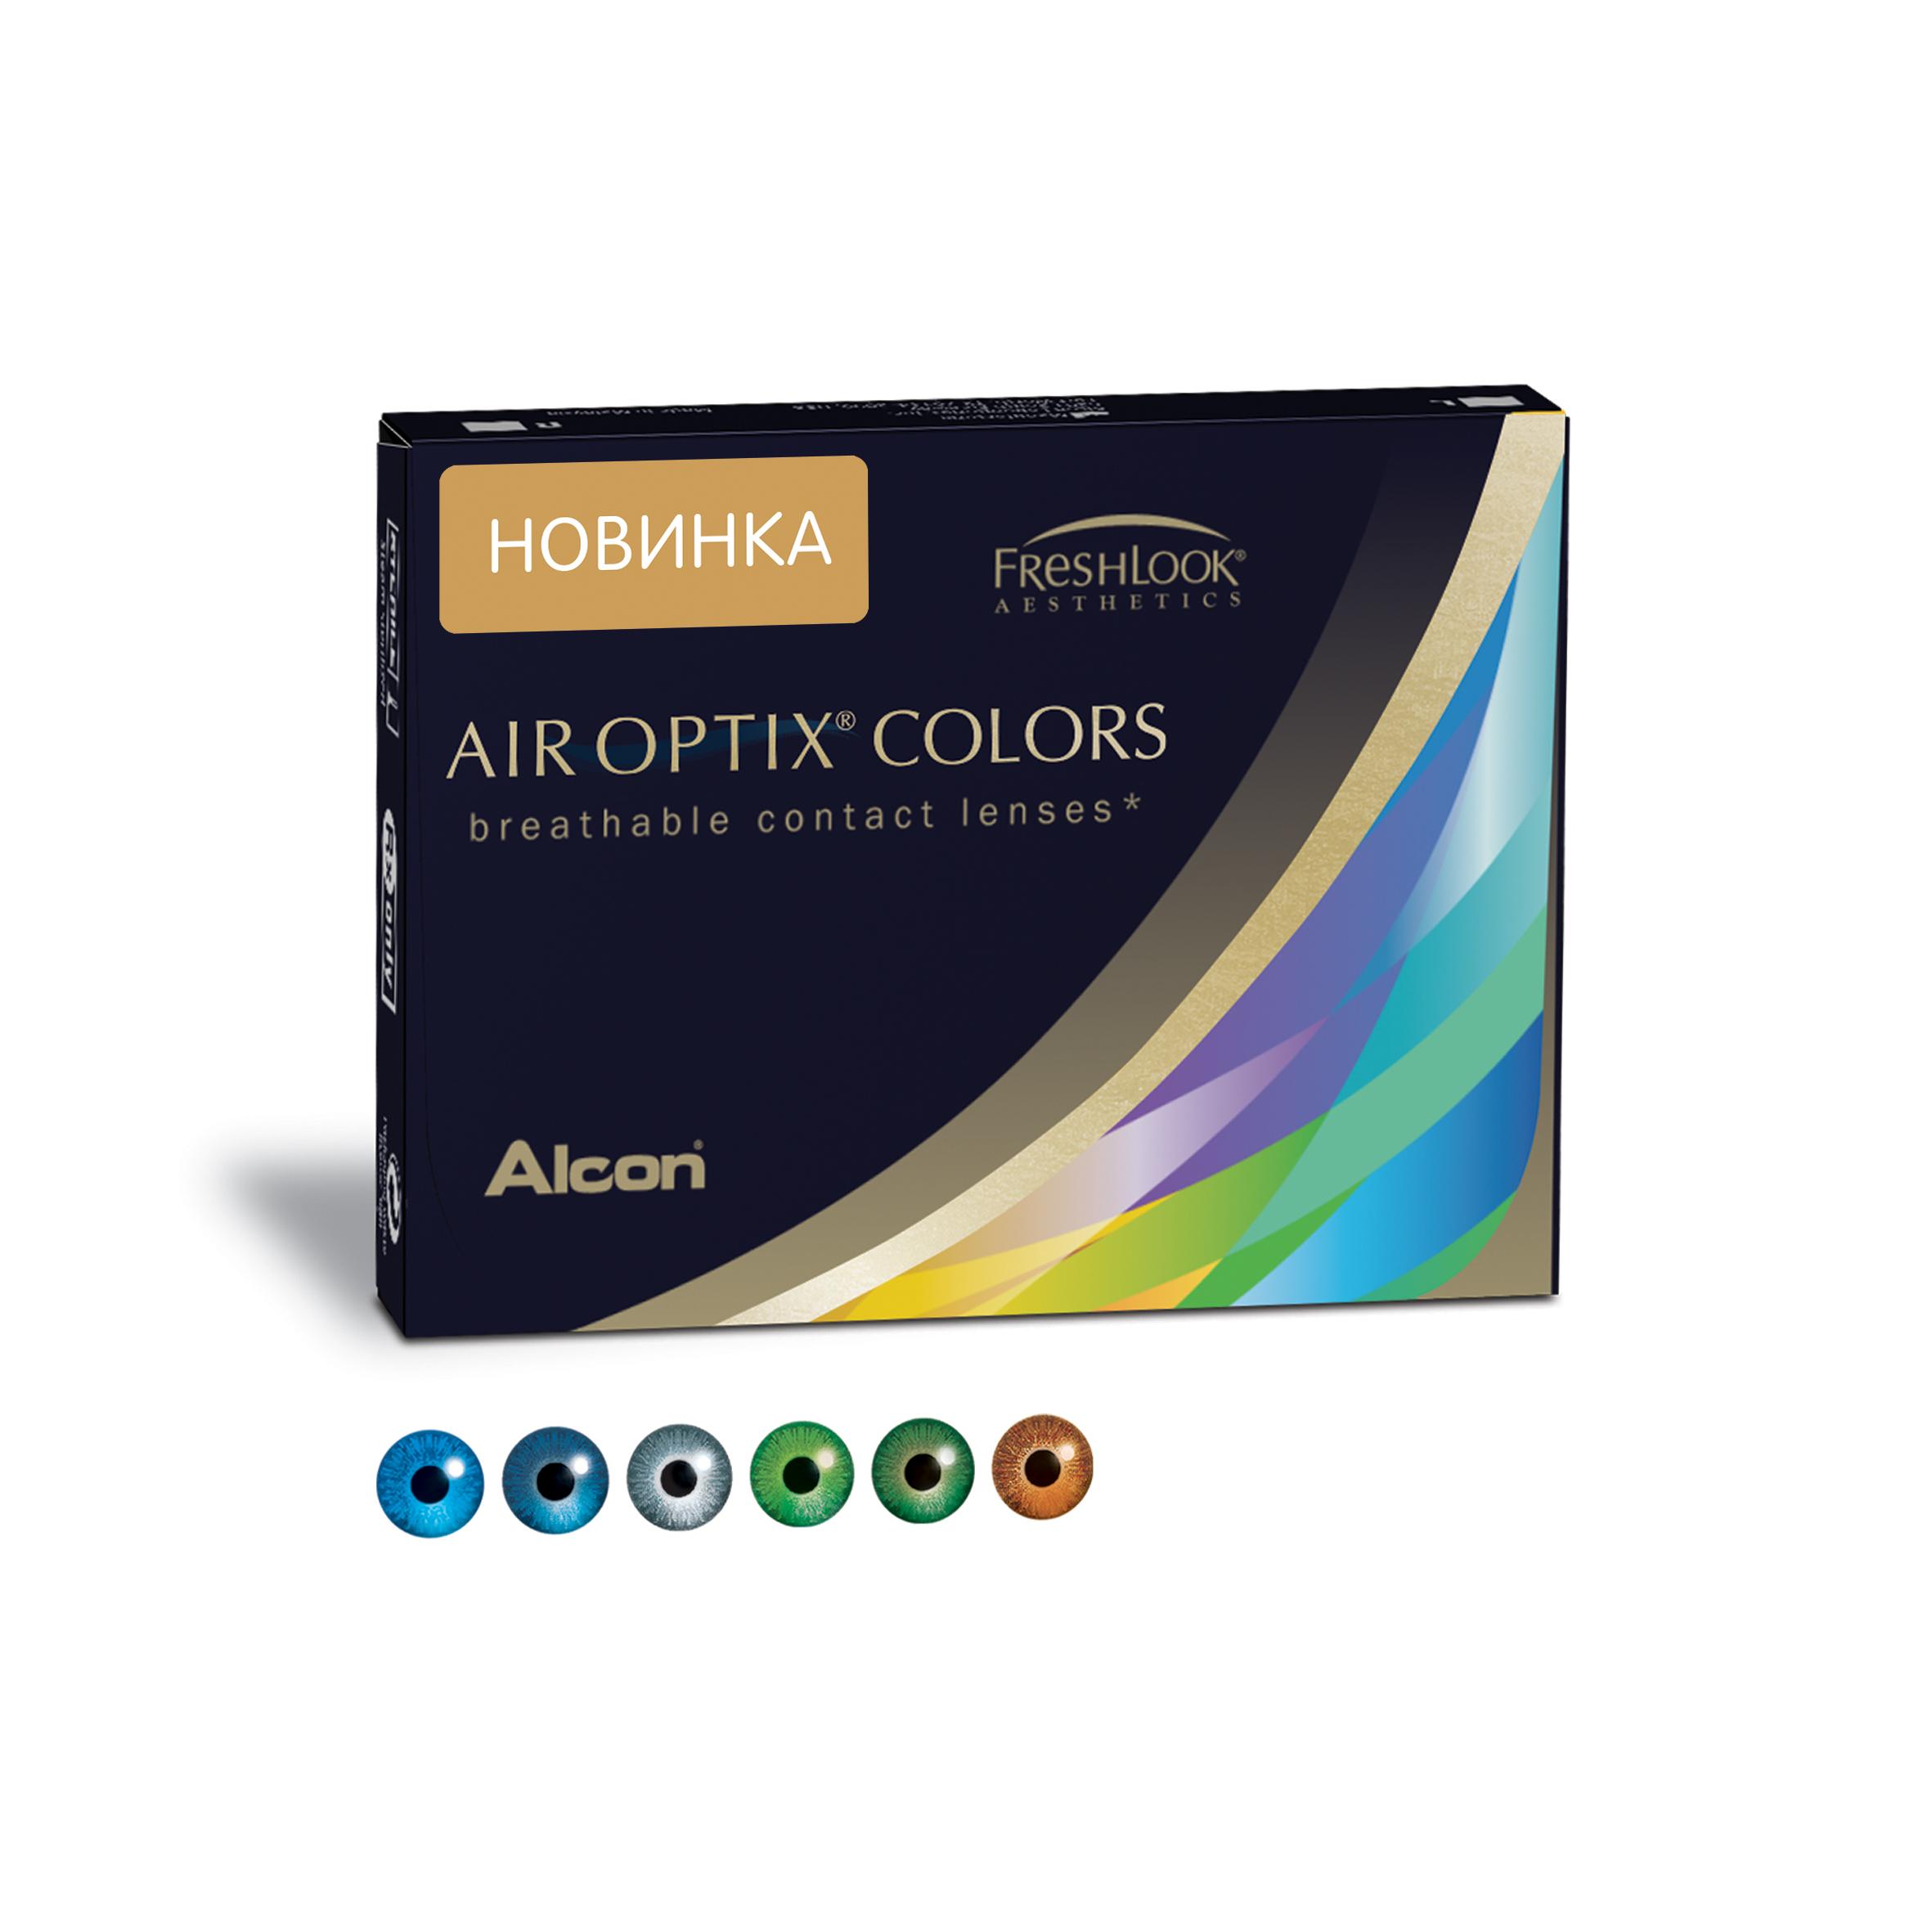 Аlcon контактные линзы Air Optix Colors 2 шт -2.00 Honey31746163Мягкие контактные линзы